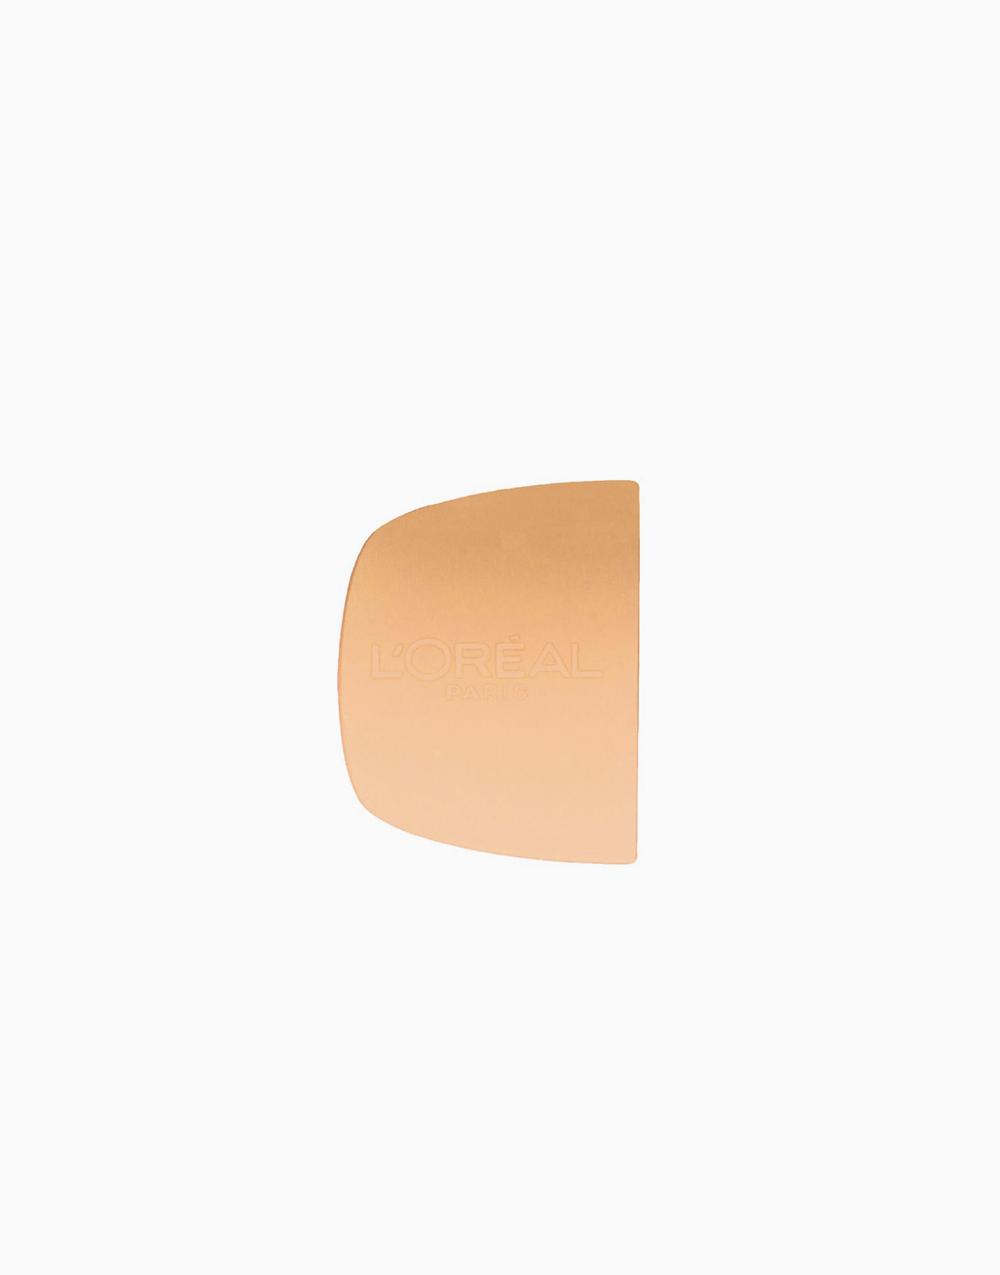 True Match Even Perfecting Powder Foundation Refill SPF32 PA+++ by L'Oréal Paris | G6 Gold Vanilla